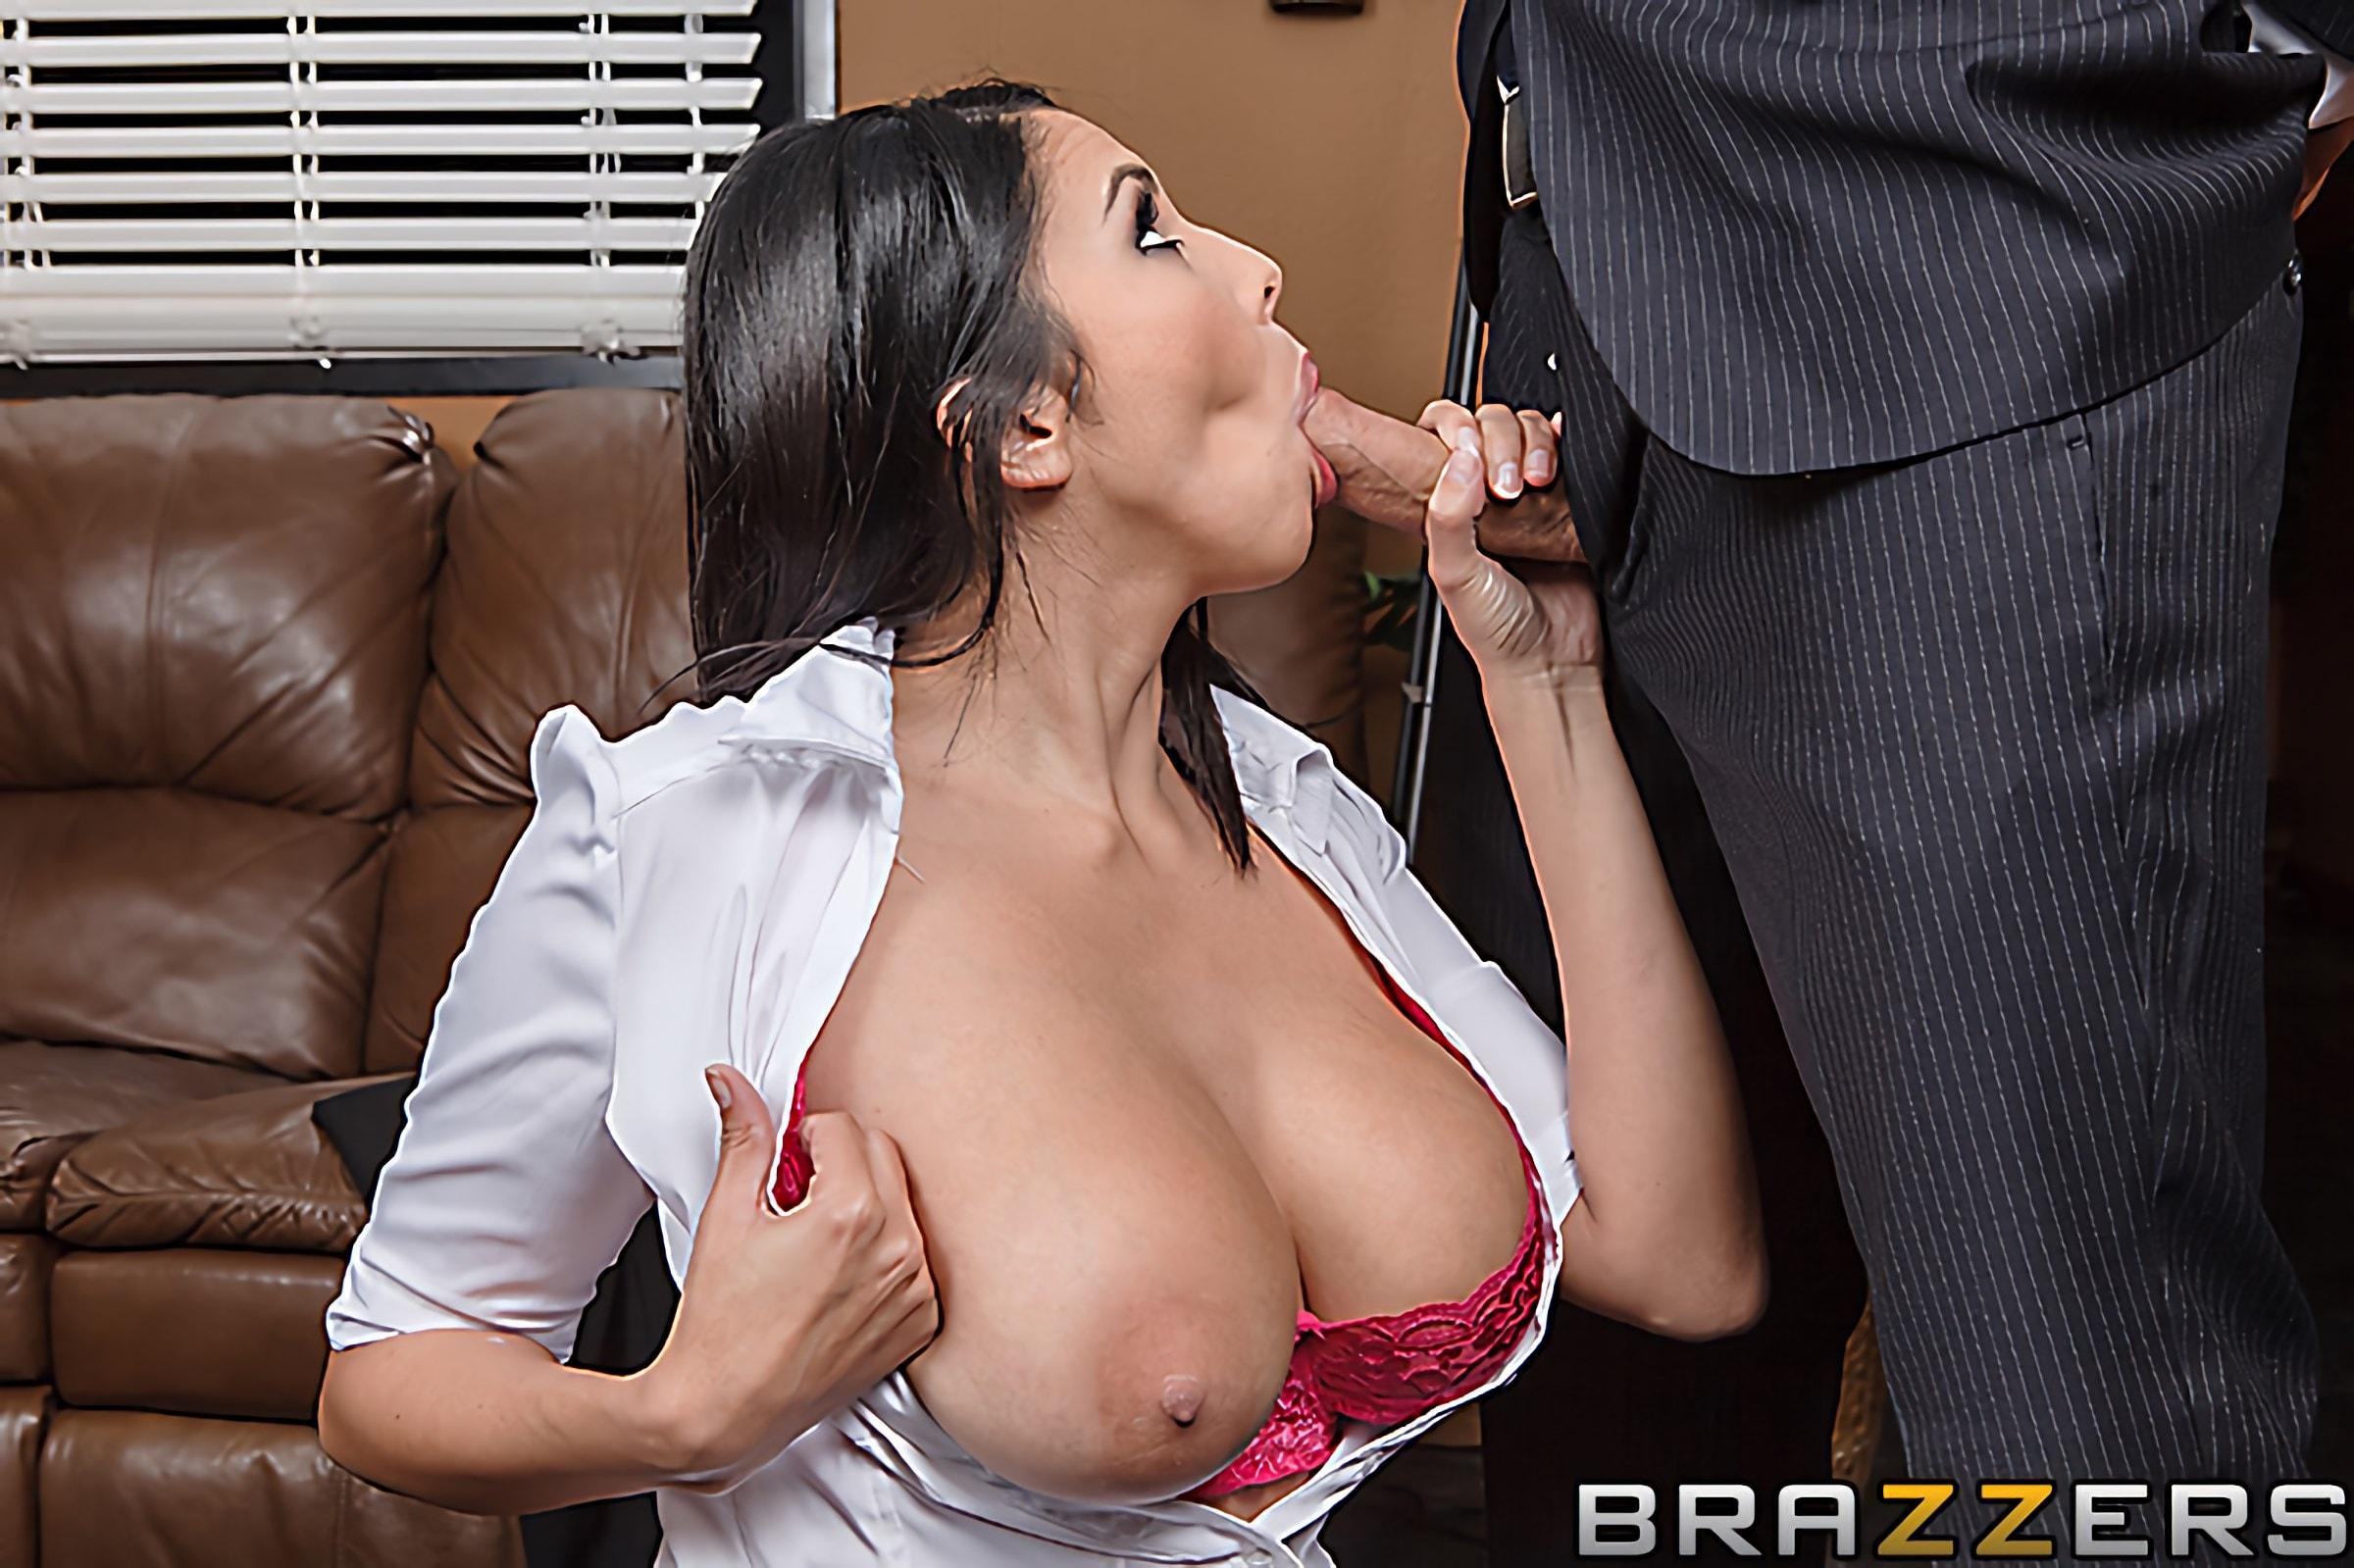 Brazzers 'Listening and Lust' starring Missy Martinez (Photo 3)